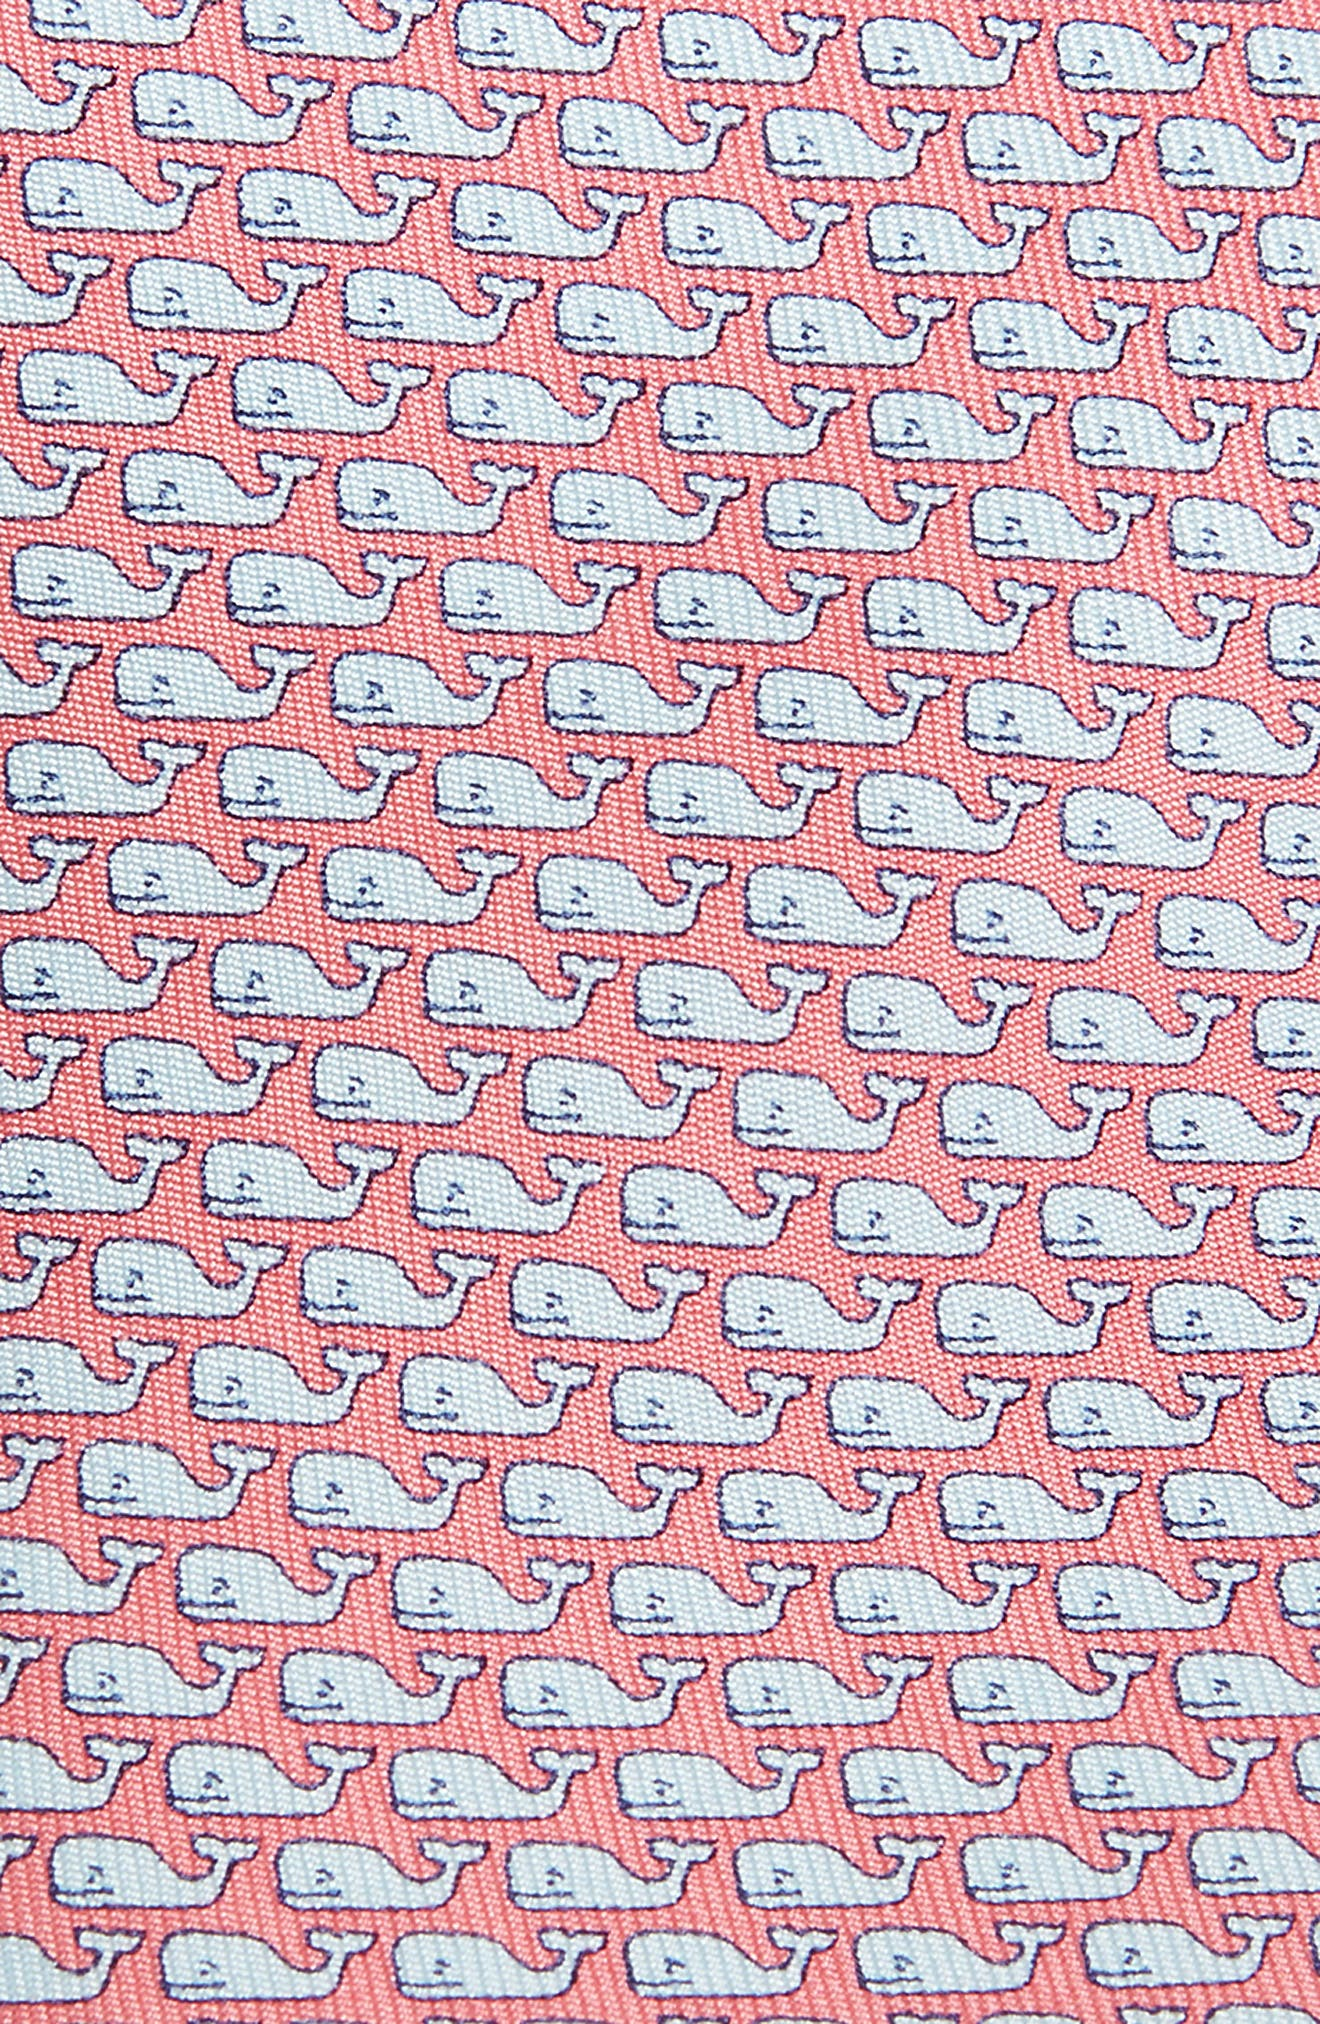 Whale Silk Tie,                             Alternate thumbnail 2, color,                             670